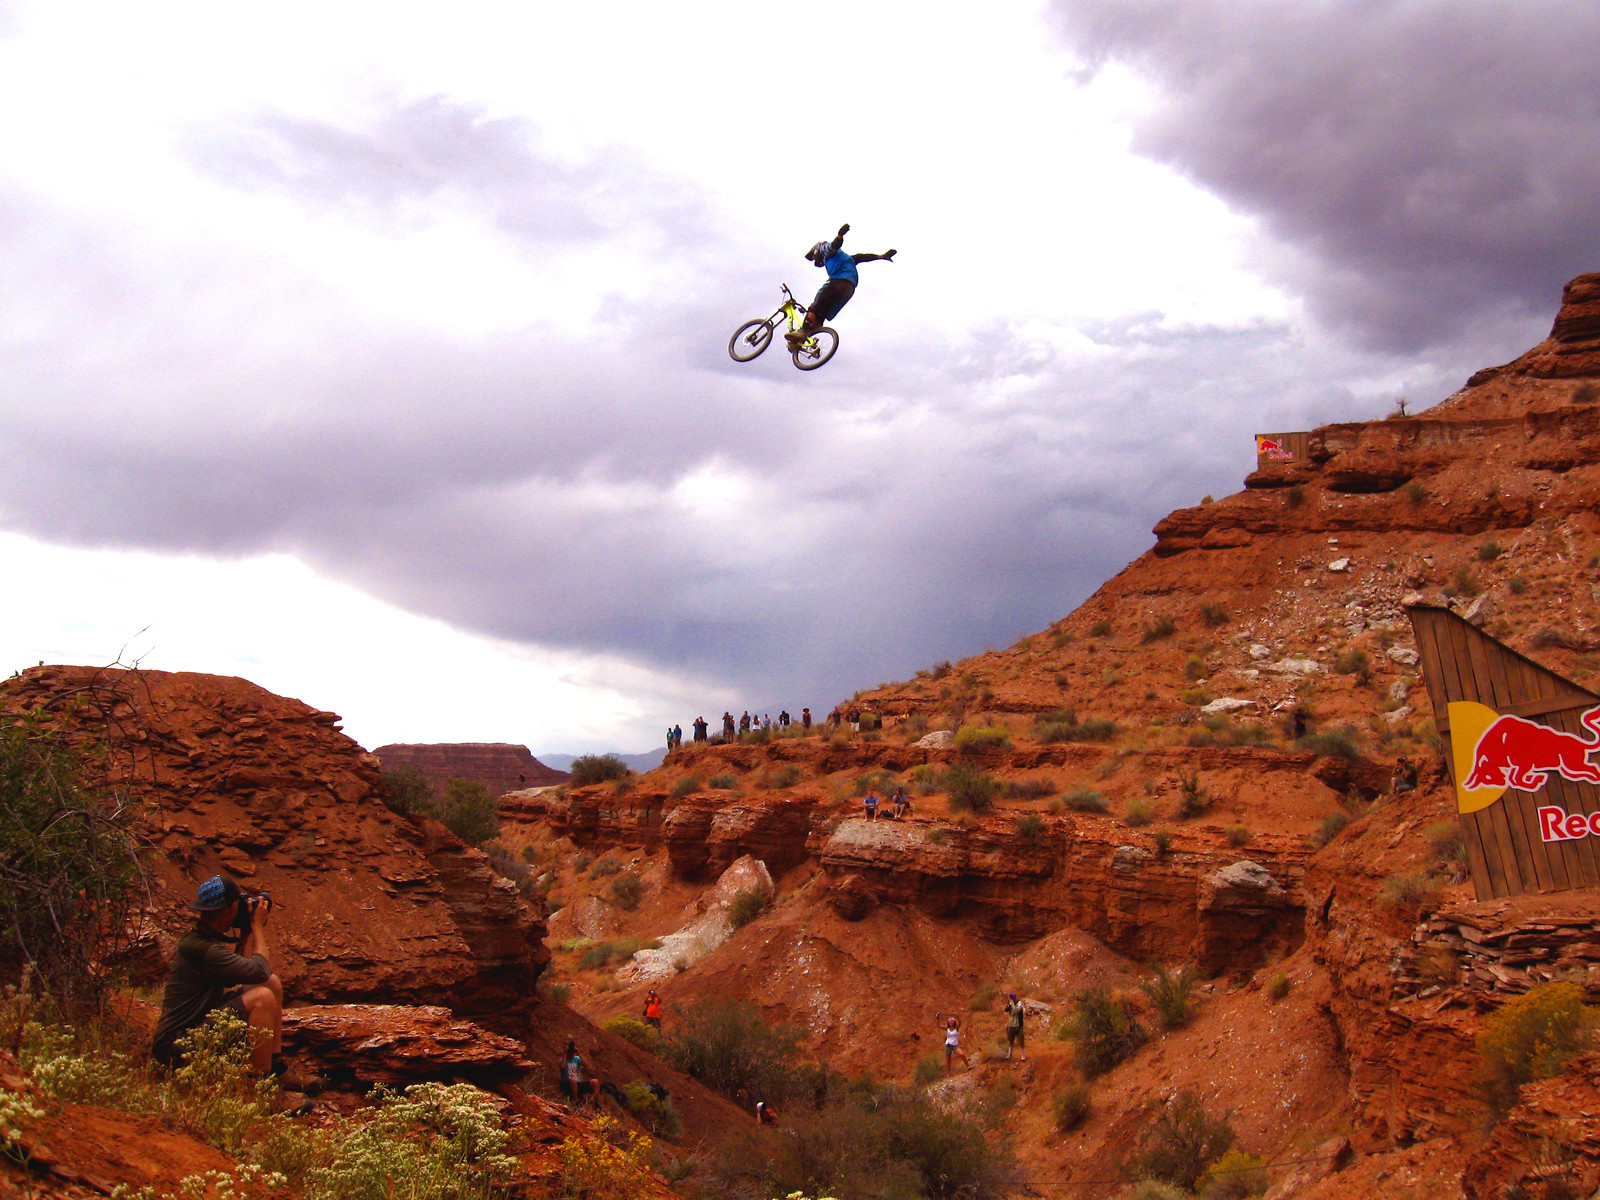 Thomas Vanderham Suicide No-Hander - Bike Doc - Mountain Biking Pictures - Vital MTB